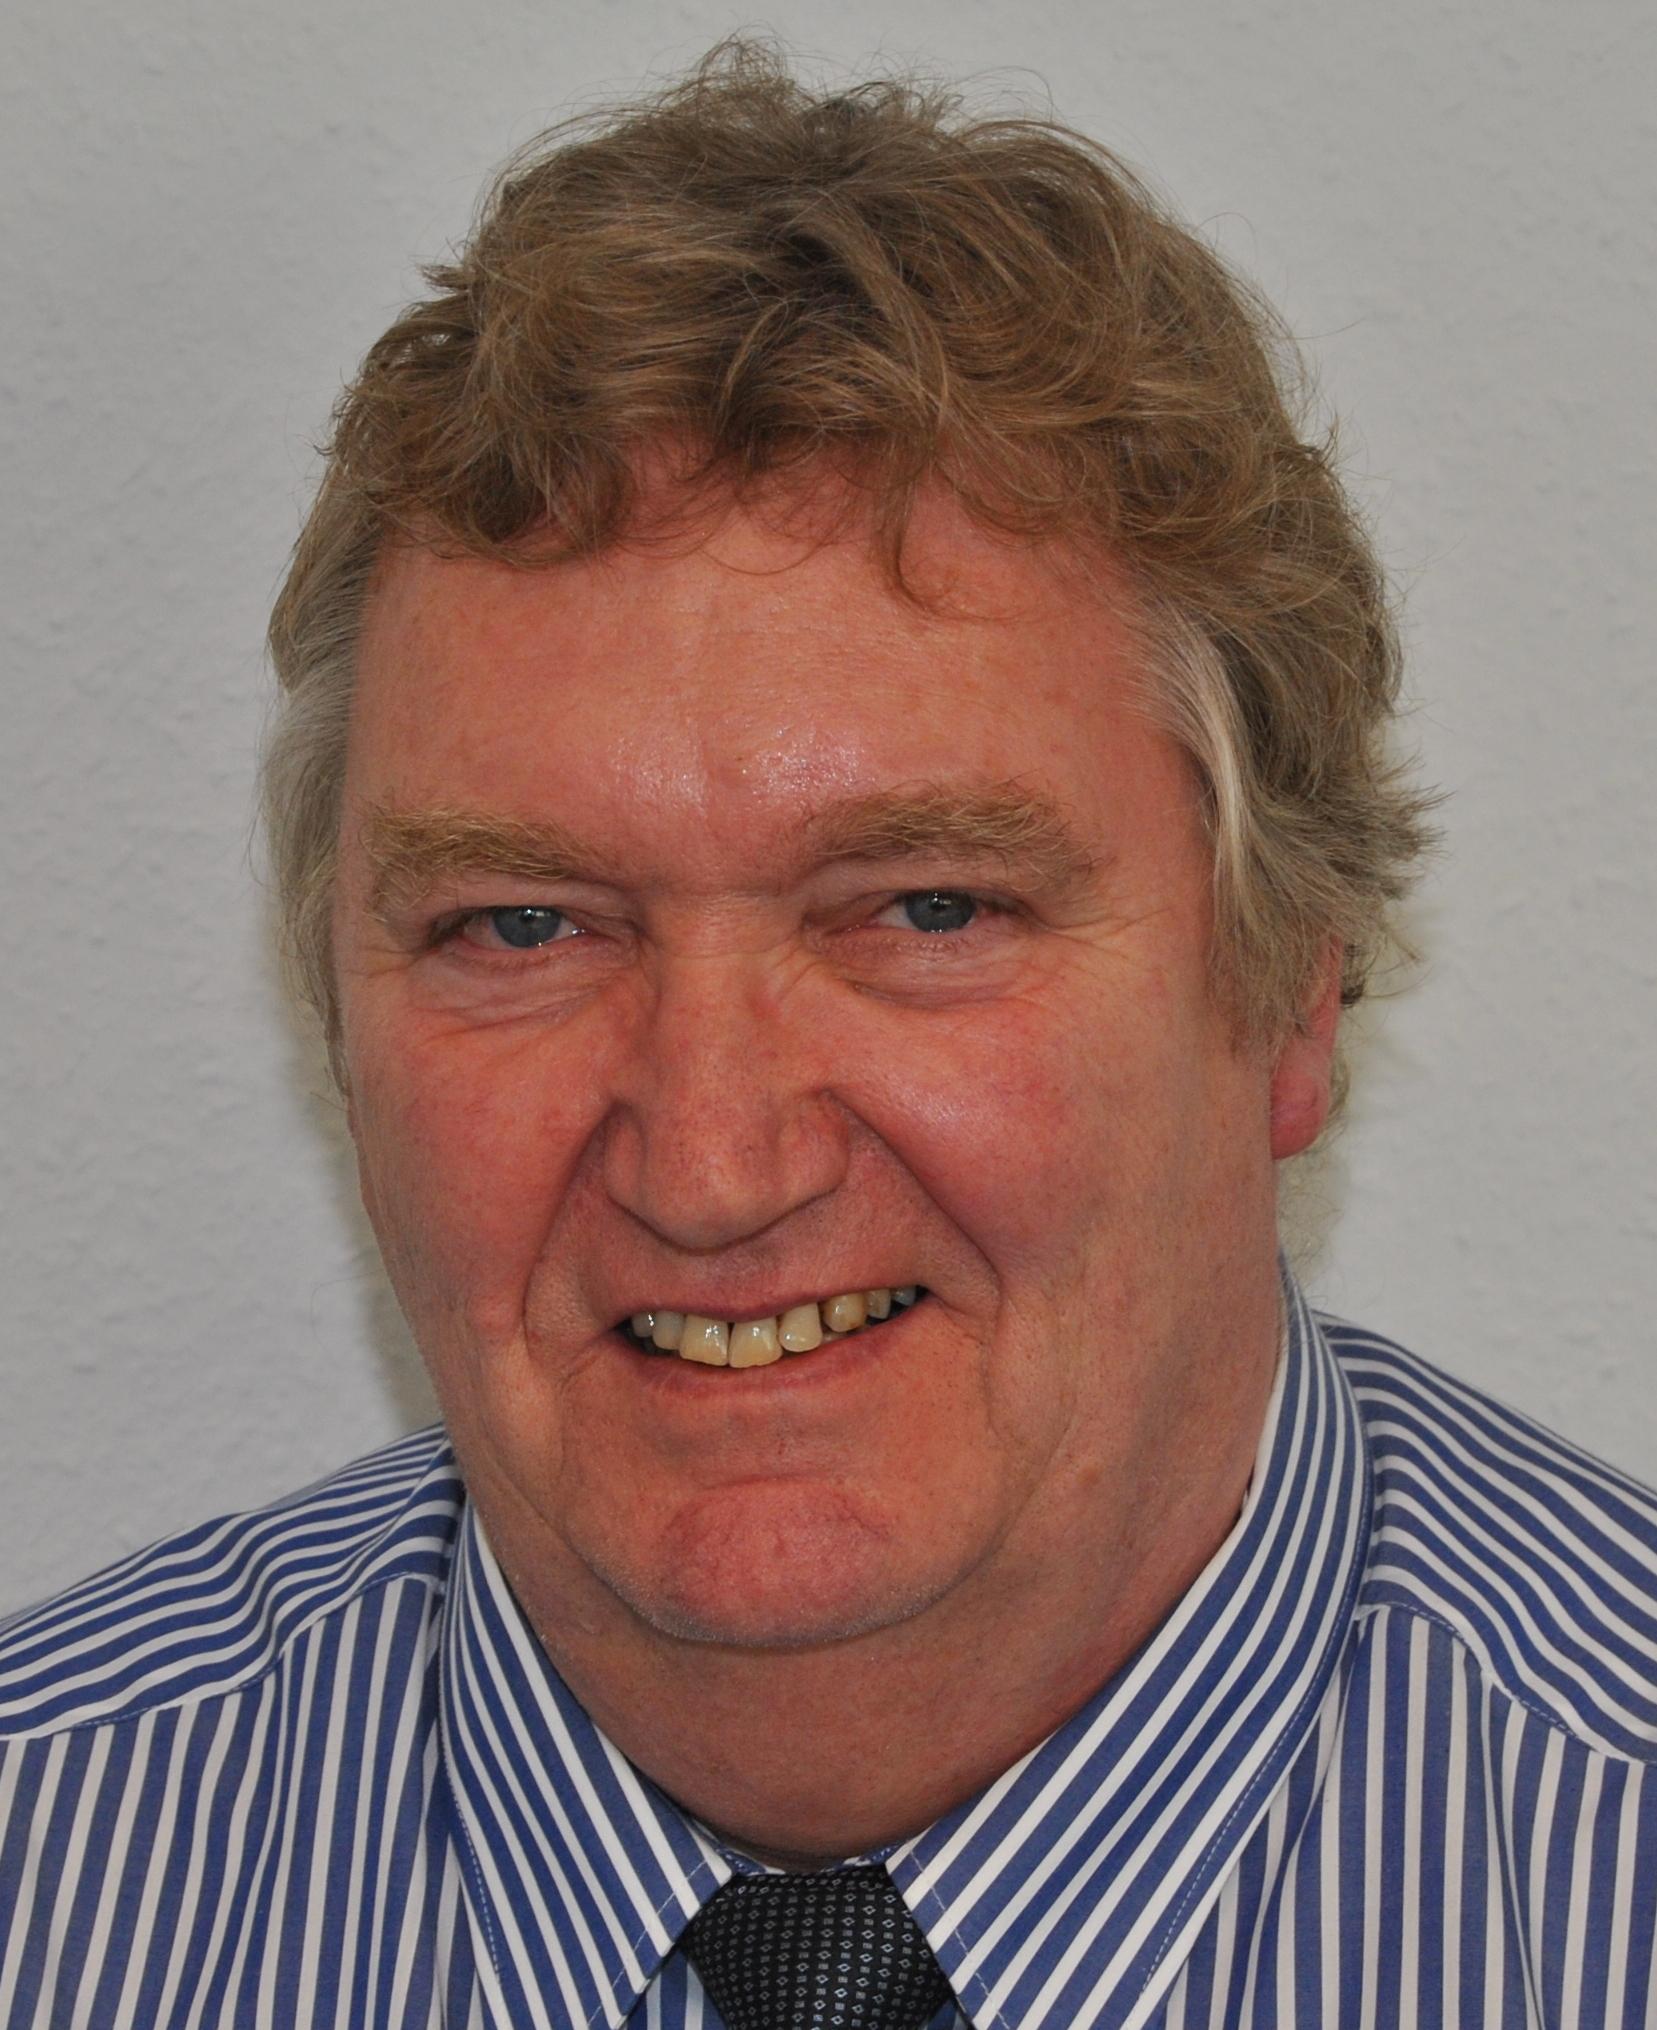 Hdh website startseite for Dieter hoffmann